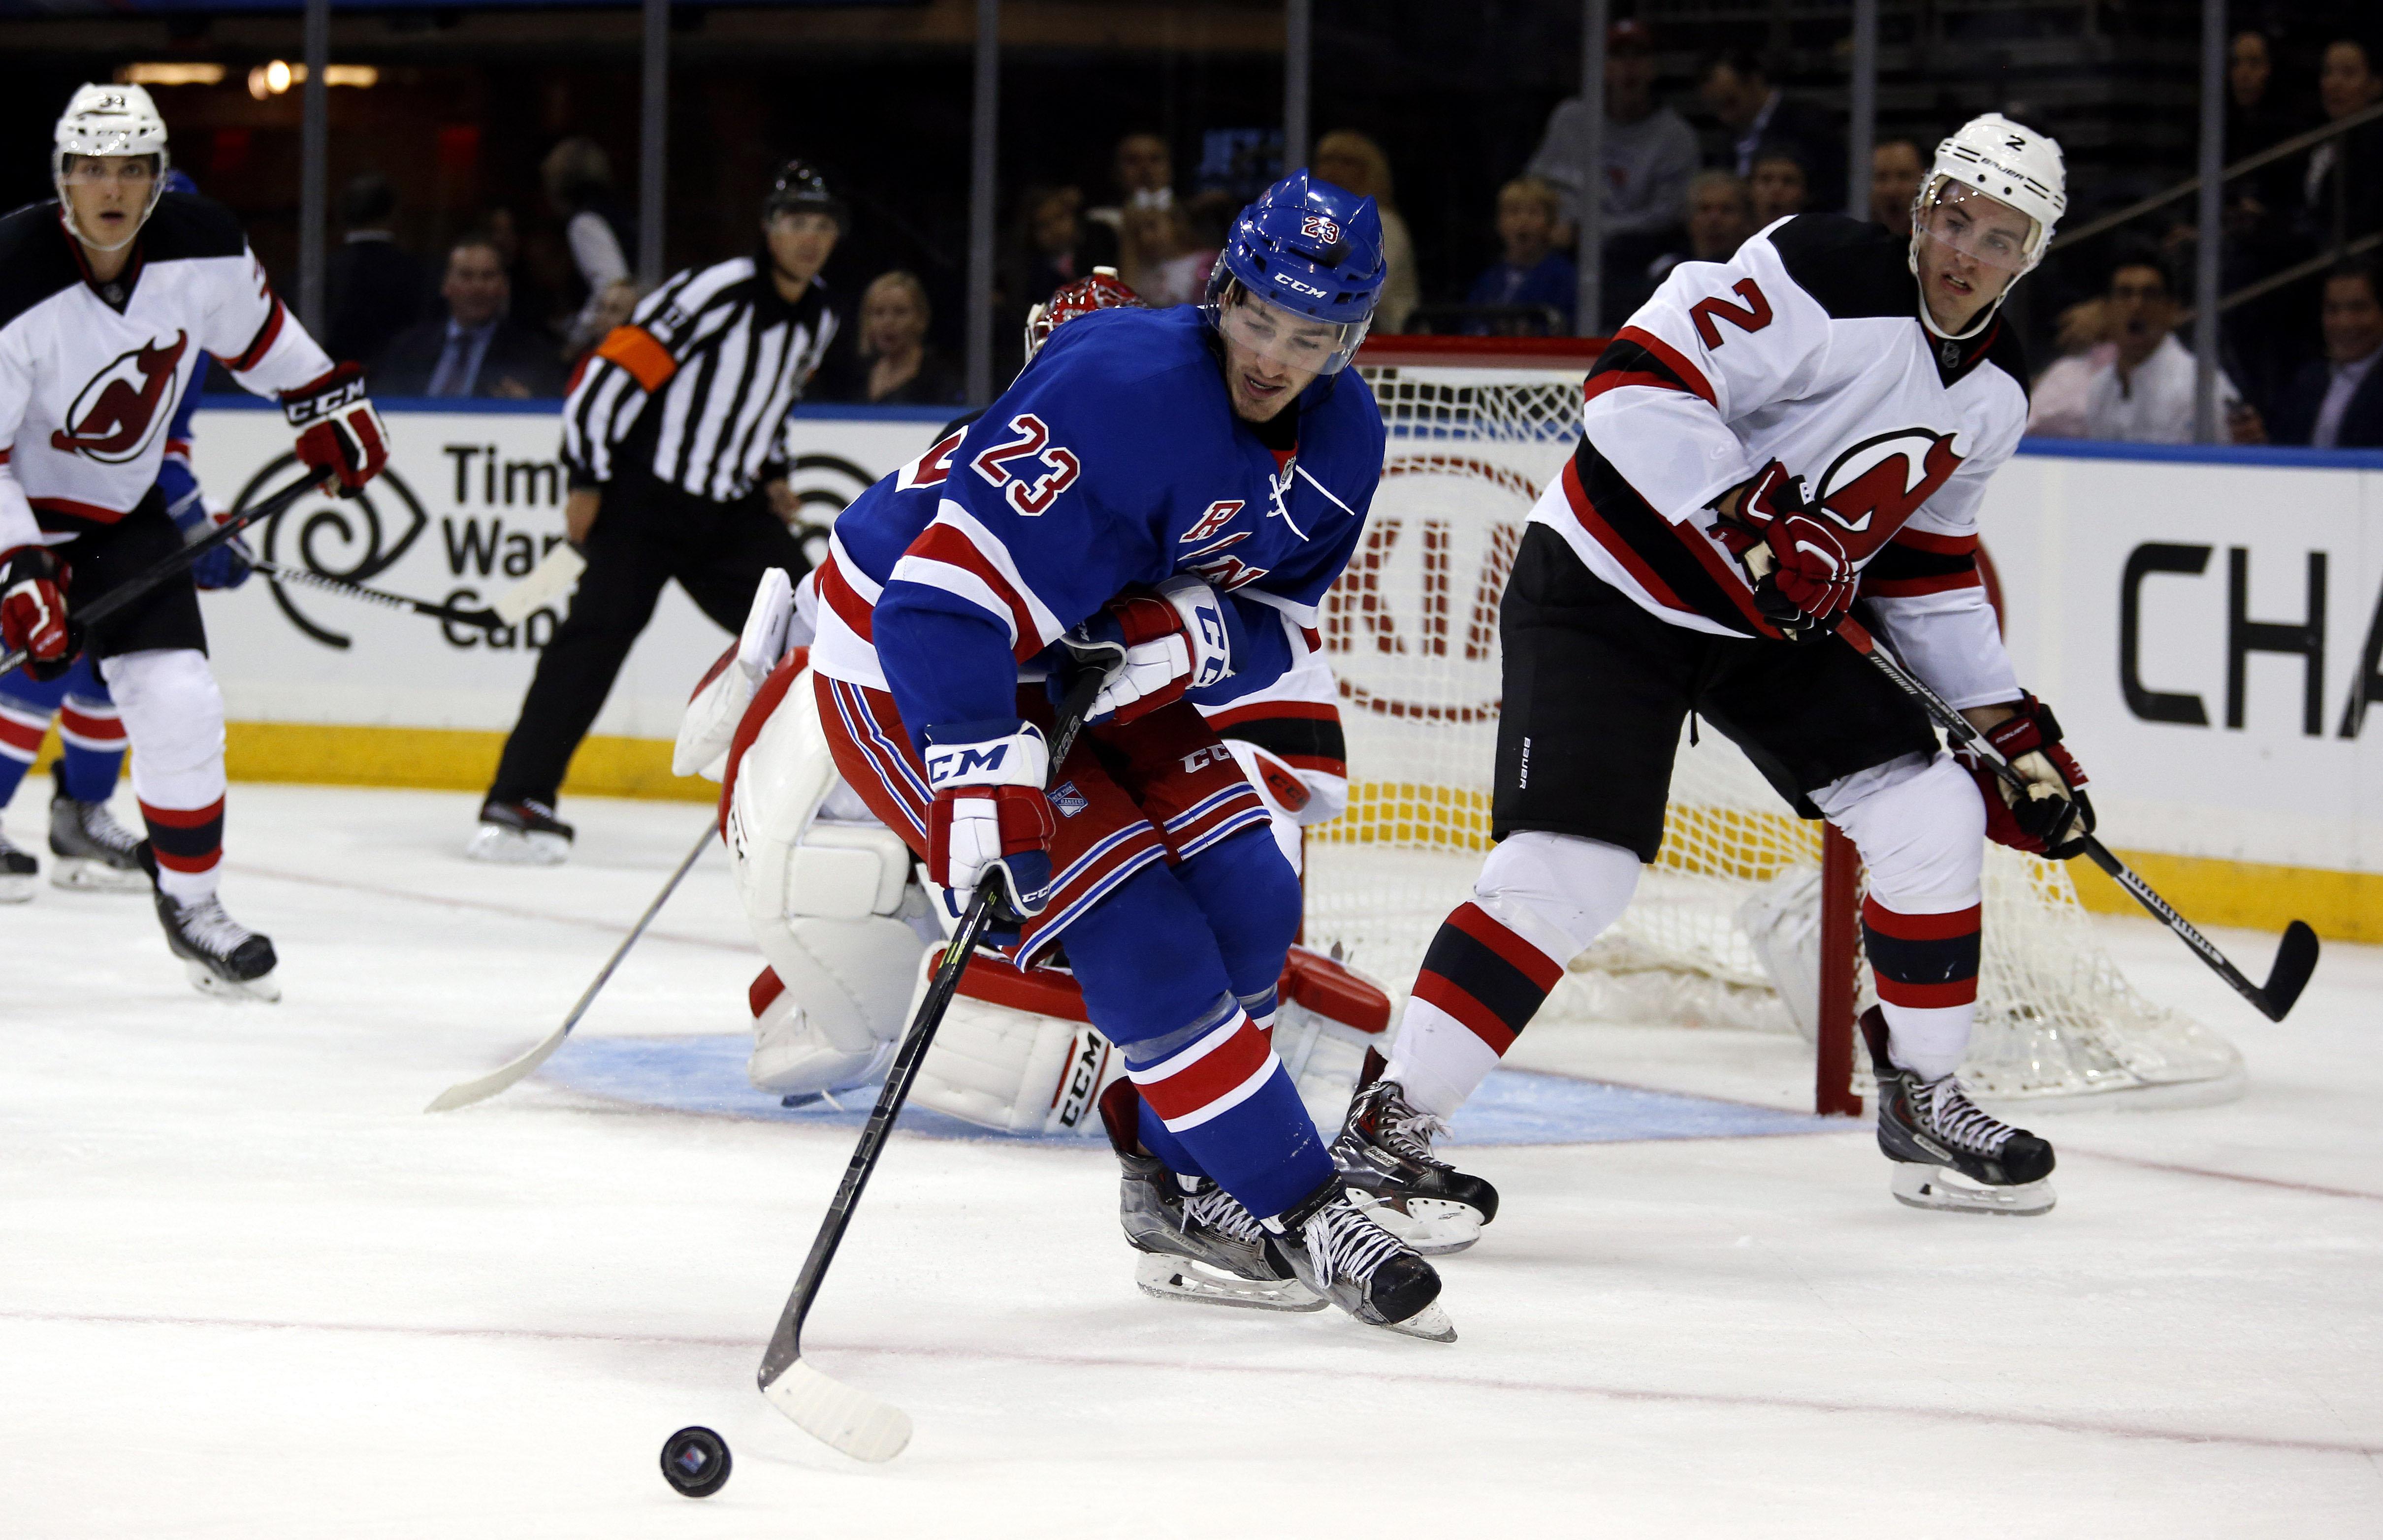 Rangers Pregame Stoll & Etem in Tonight s Lineup